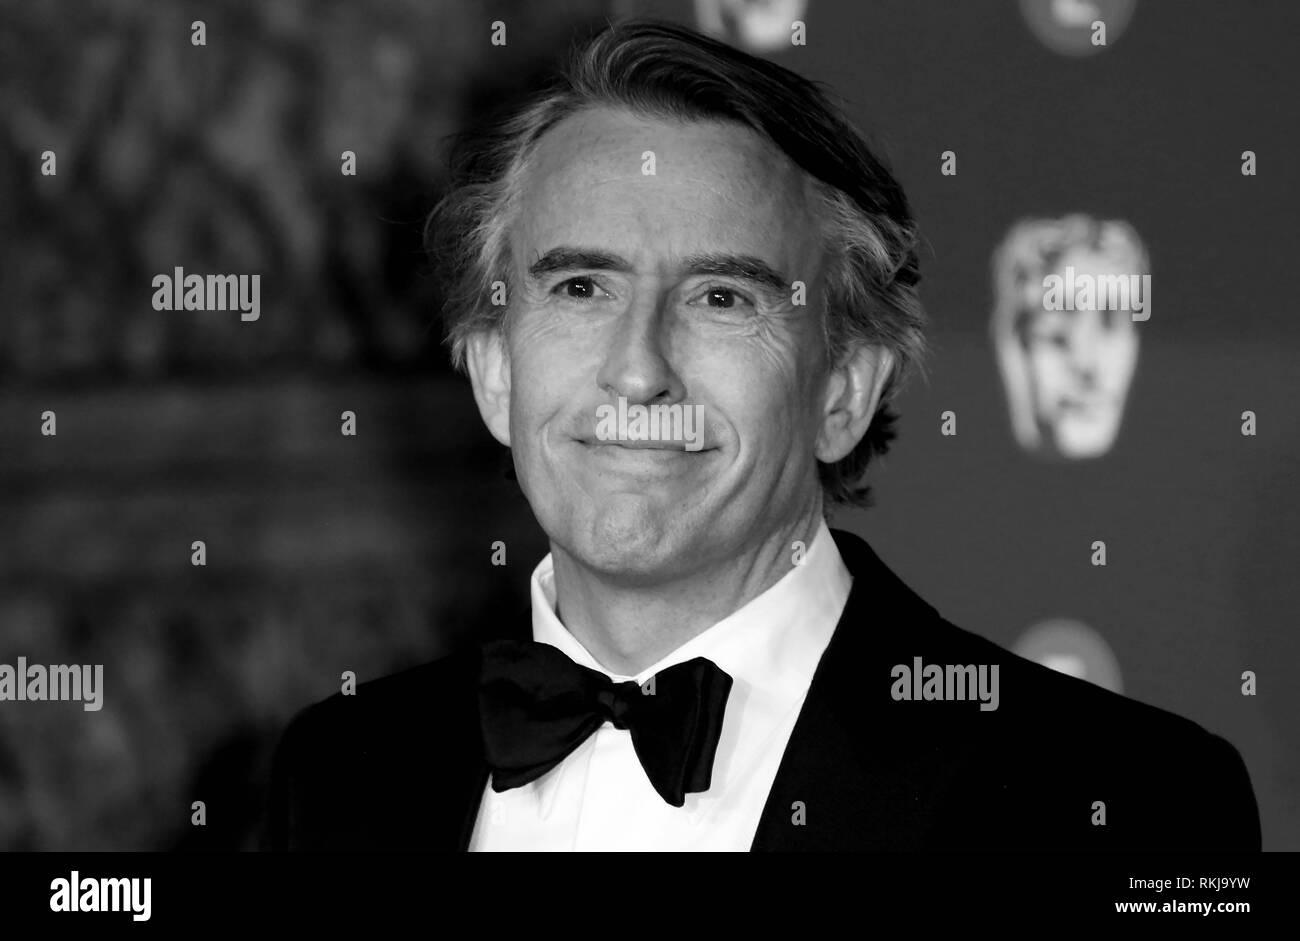 Feb 10, 2019 - Steve Coogan Teilnahme an EE British Academy Film Awards 2019 - Alternative Ansicht, der Royal Albert Hall in London, Großbritannien Stockbild